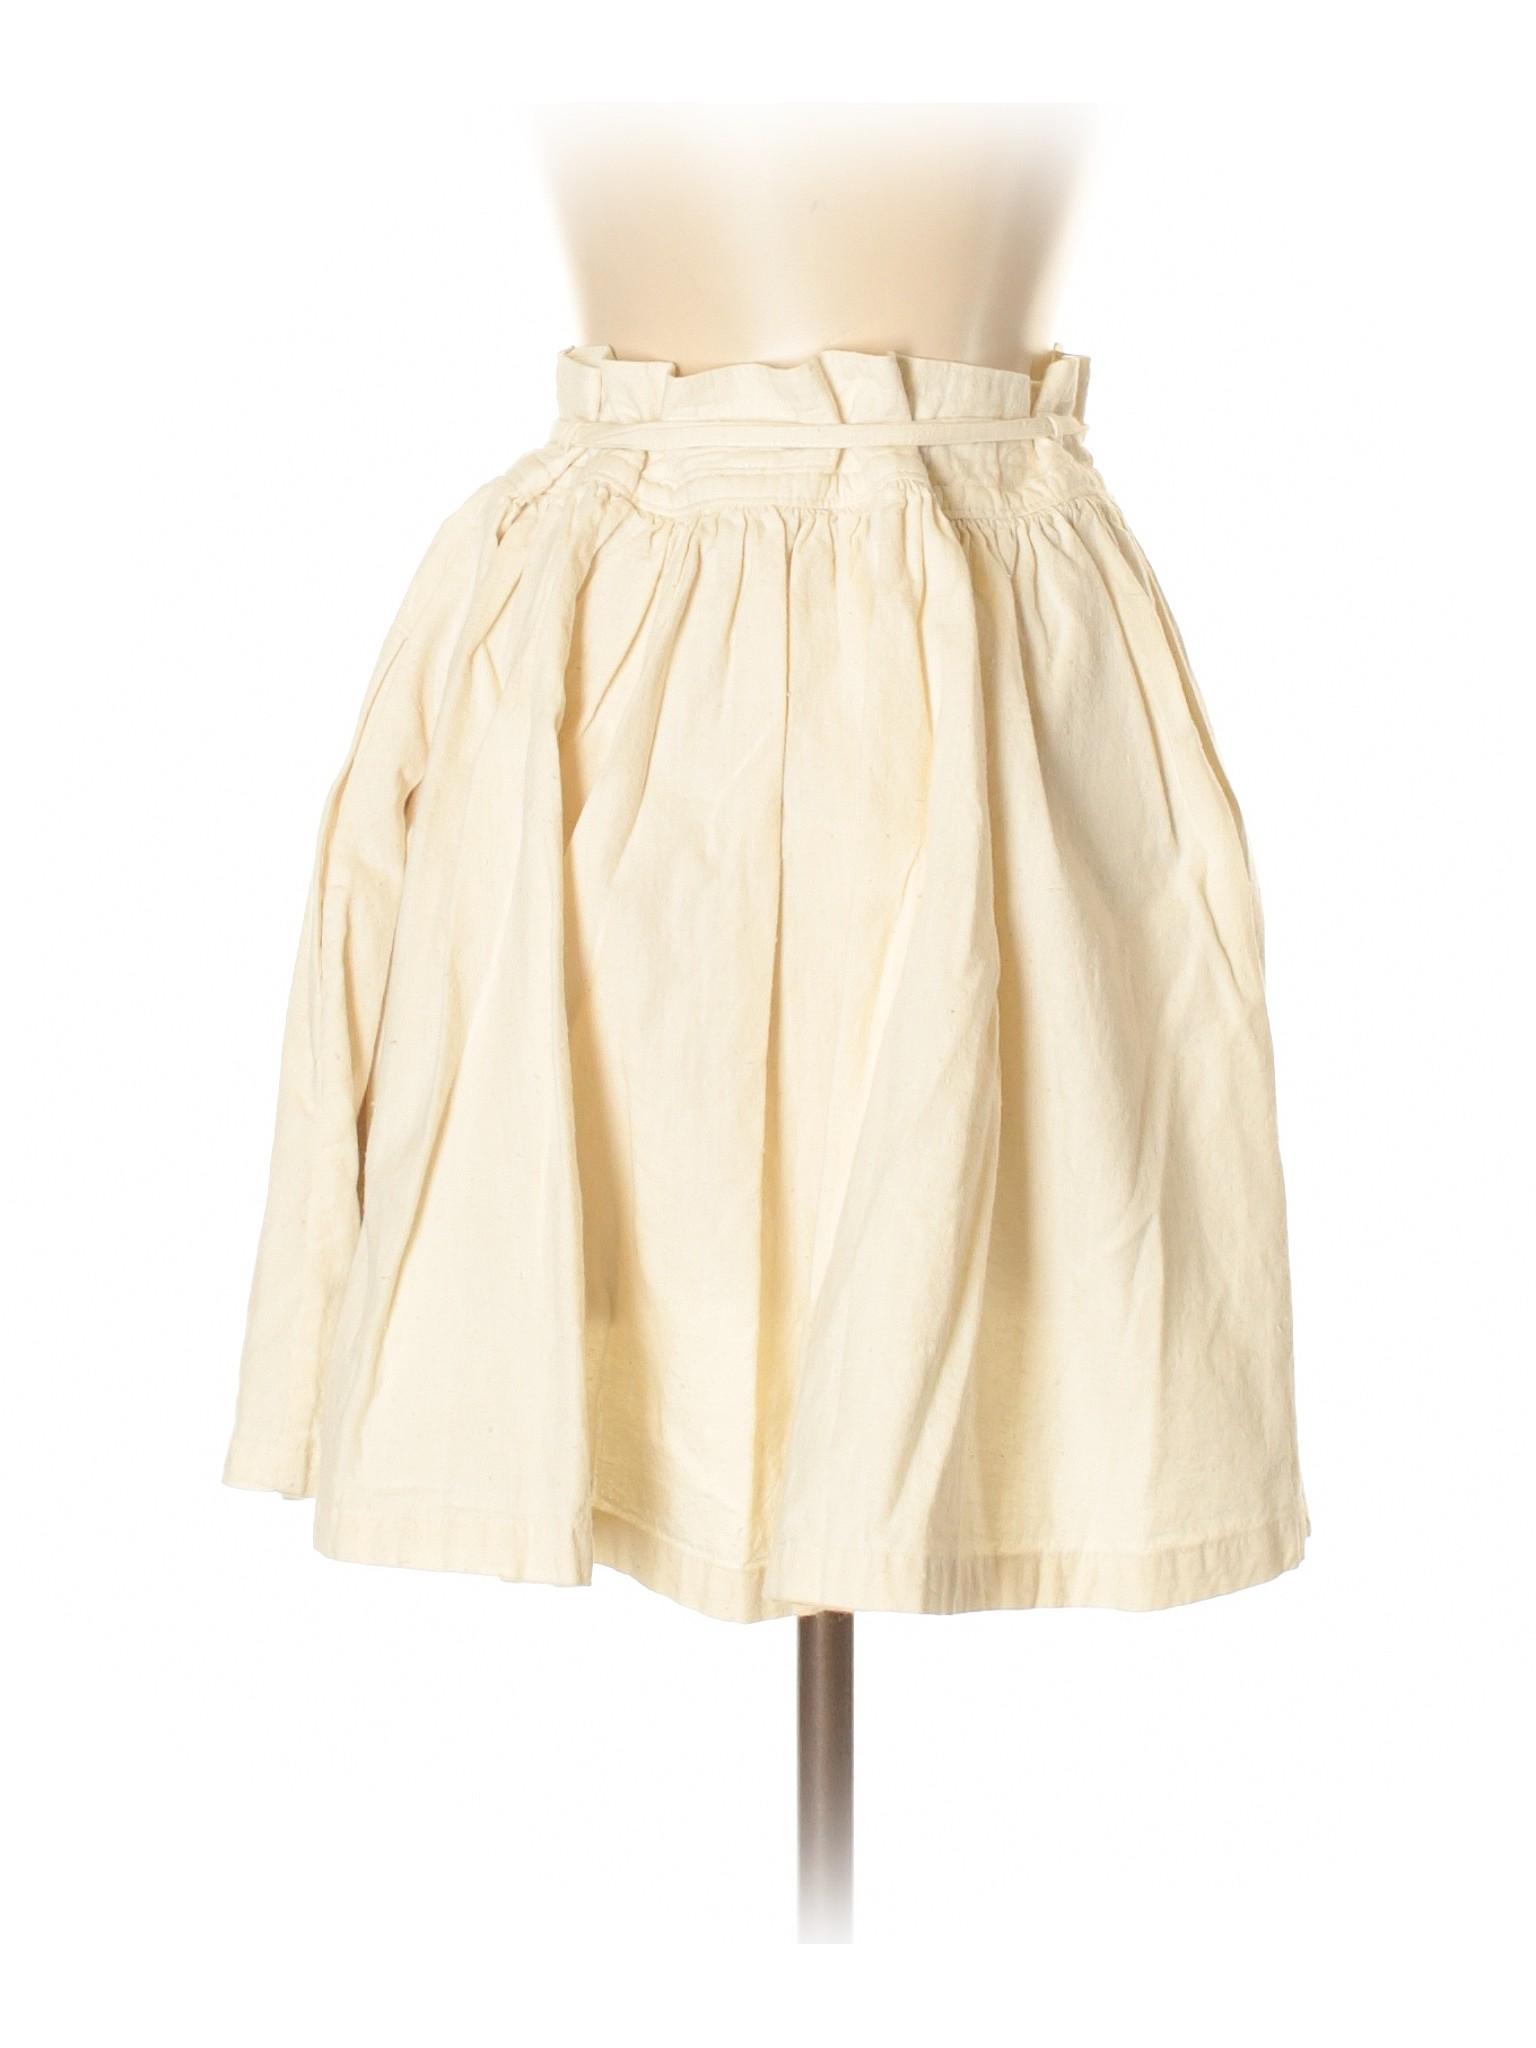 Skirt Boutique Casual Casual Skirt Skirt Boutique Boutique Boutique Skirt Skirt Casual Boutique Casual Casual Boutique gtwqFwB